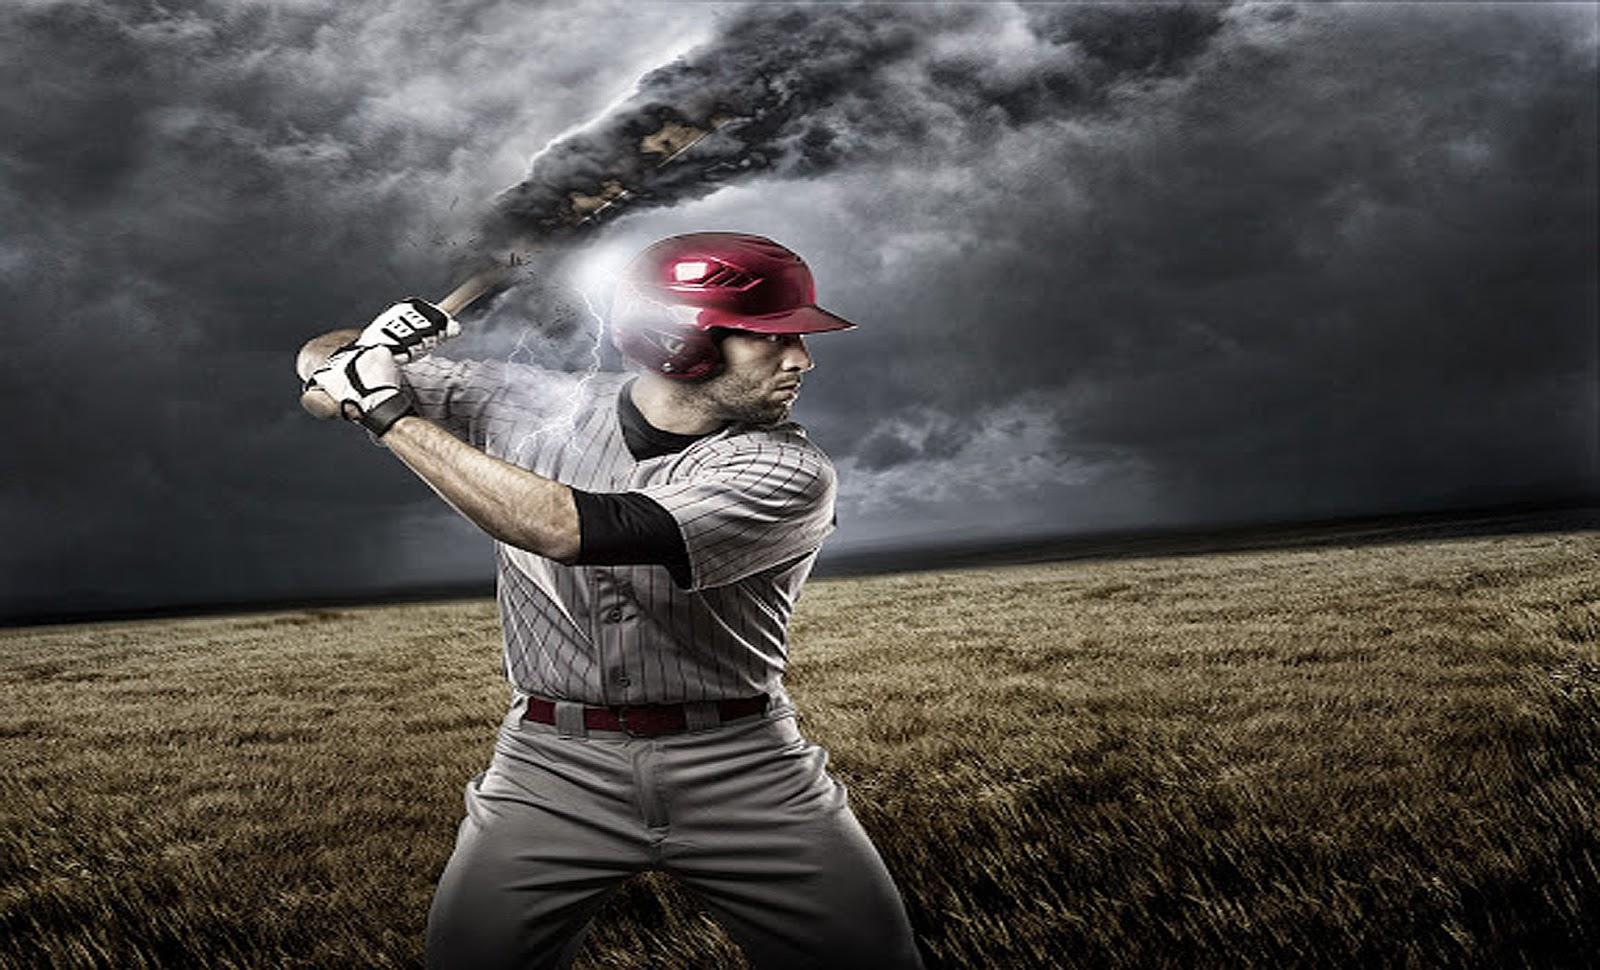 wallpaperslargecom201307baseball player with tornado standardhtml 1600x970